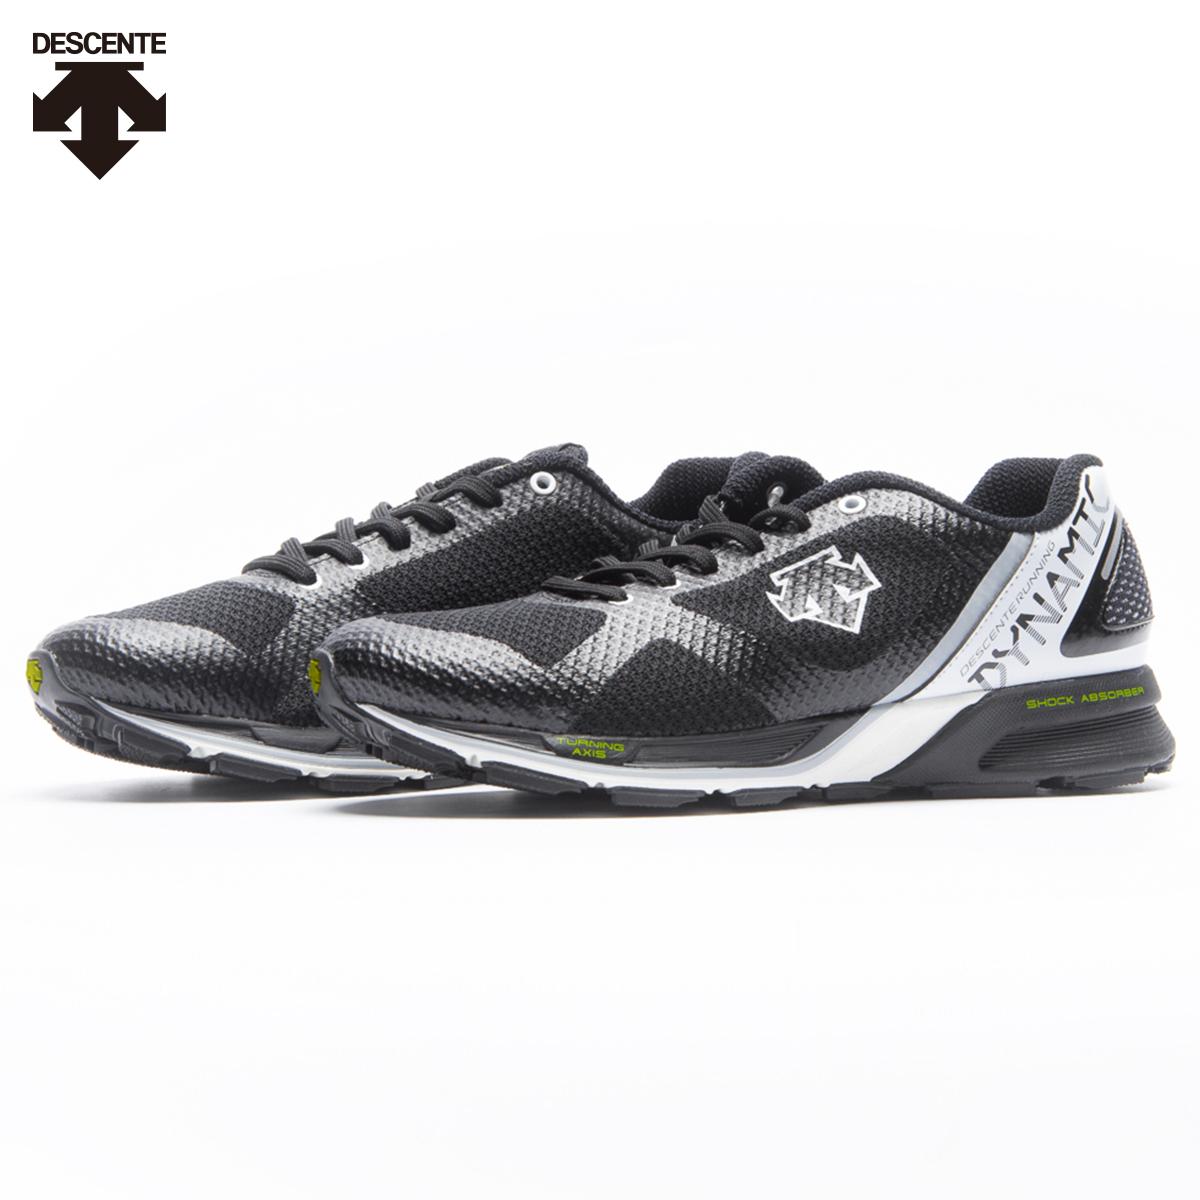 DESCENTE迪桑特男鞋 RUNNING系列 男女款跑步運動鞋 D6429RRN2